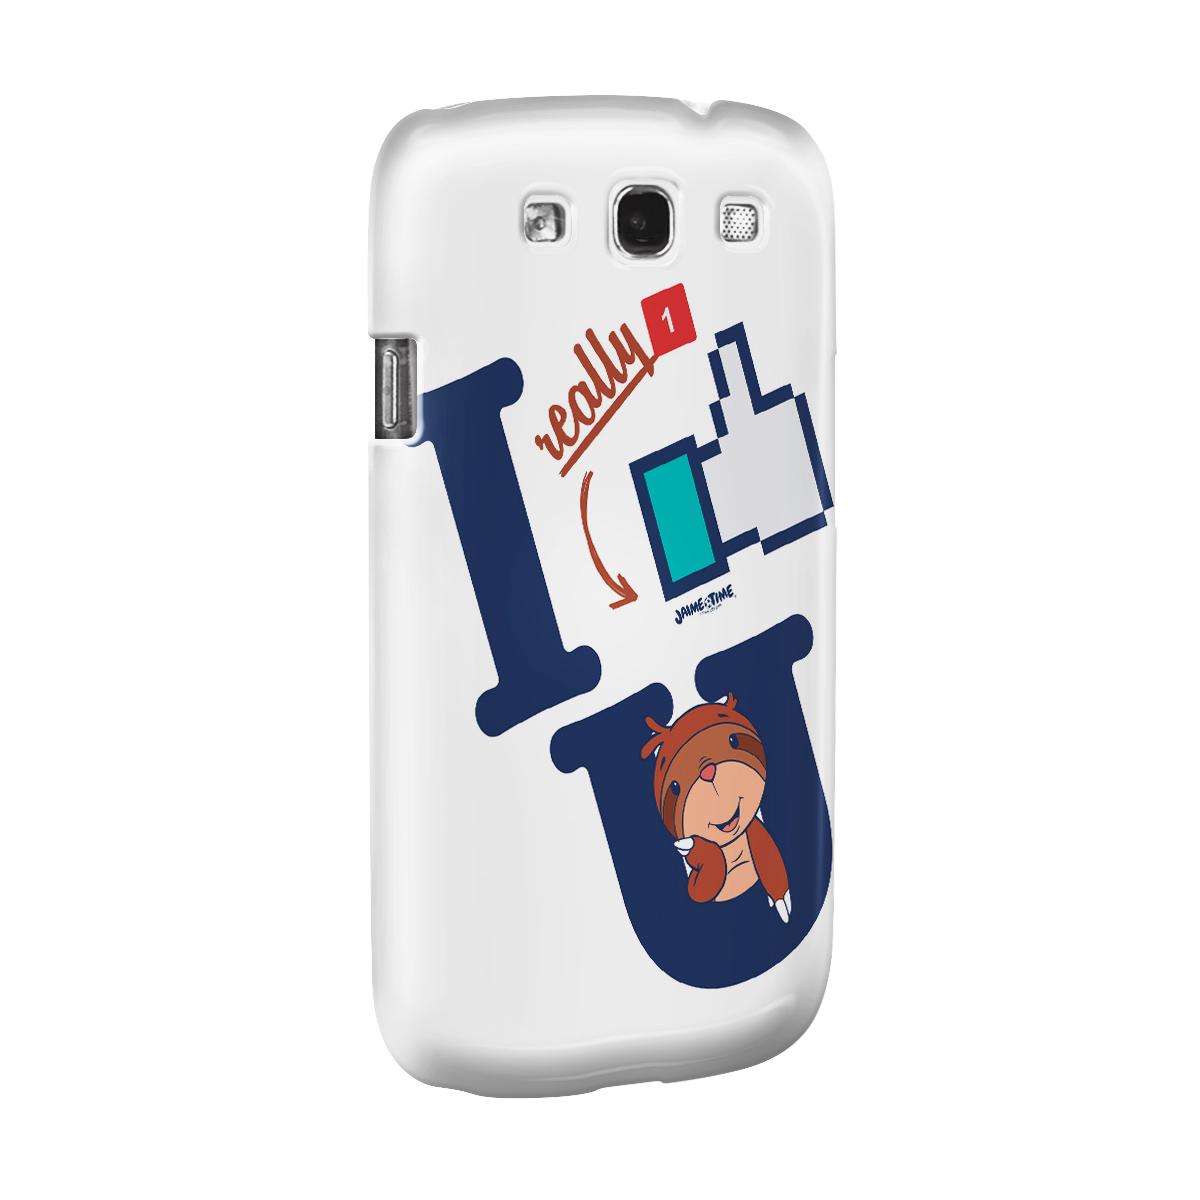 Capa para Samsung Galaxy S3 Jaime I Like You